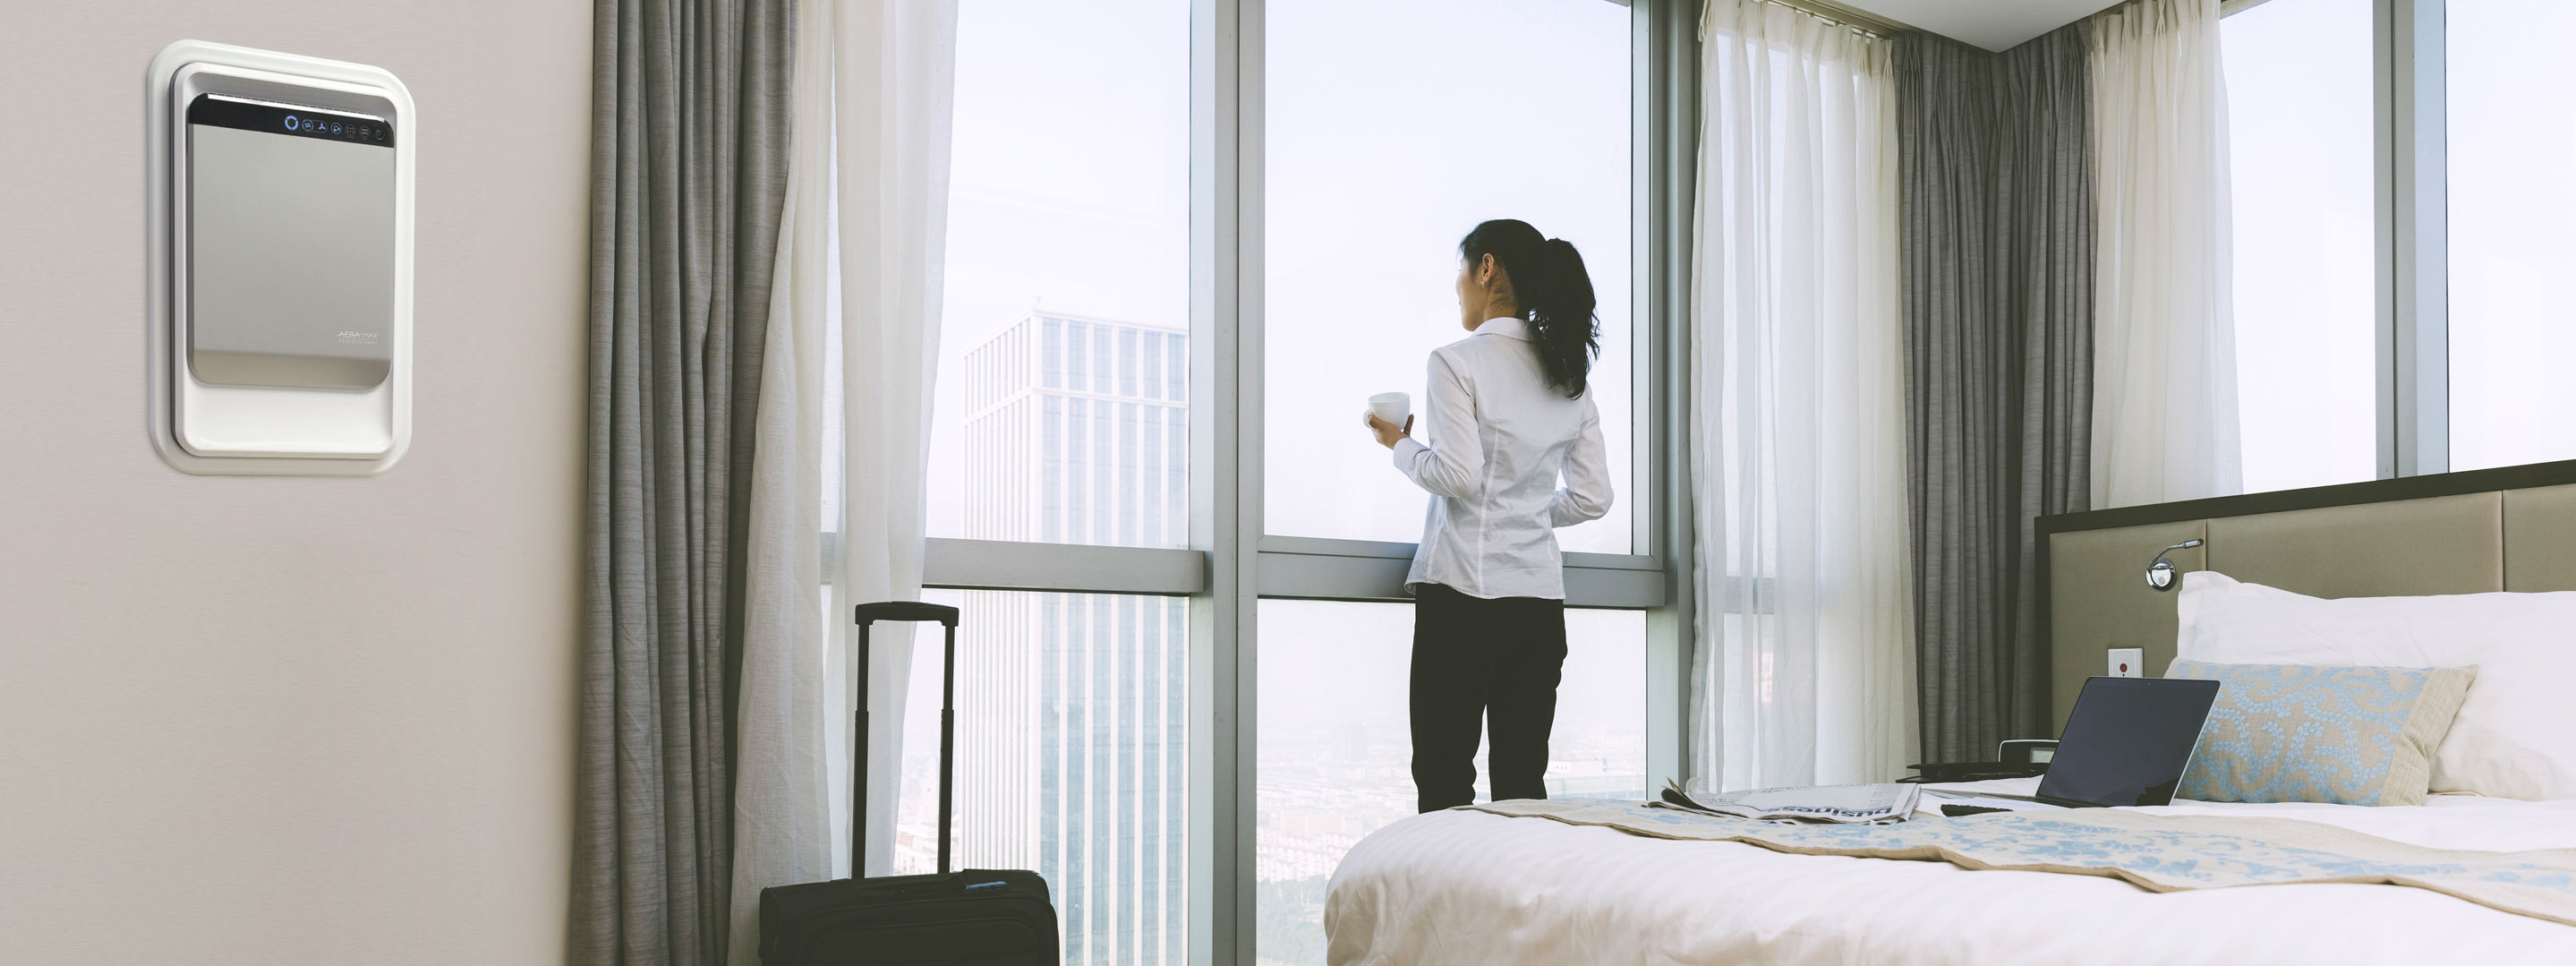 AeraMax Professional – Hotelarstwo